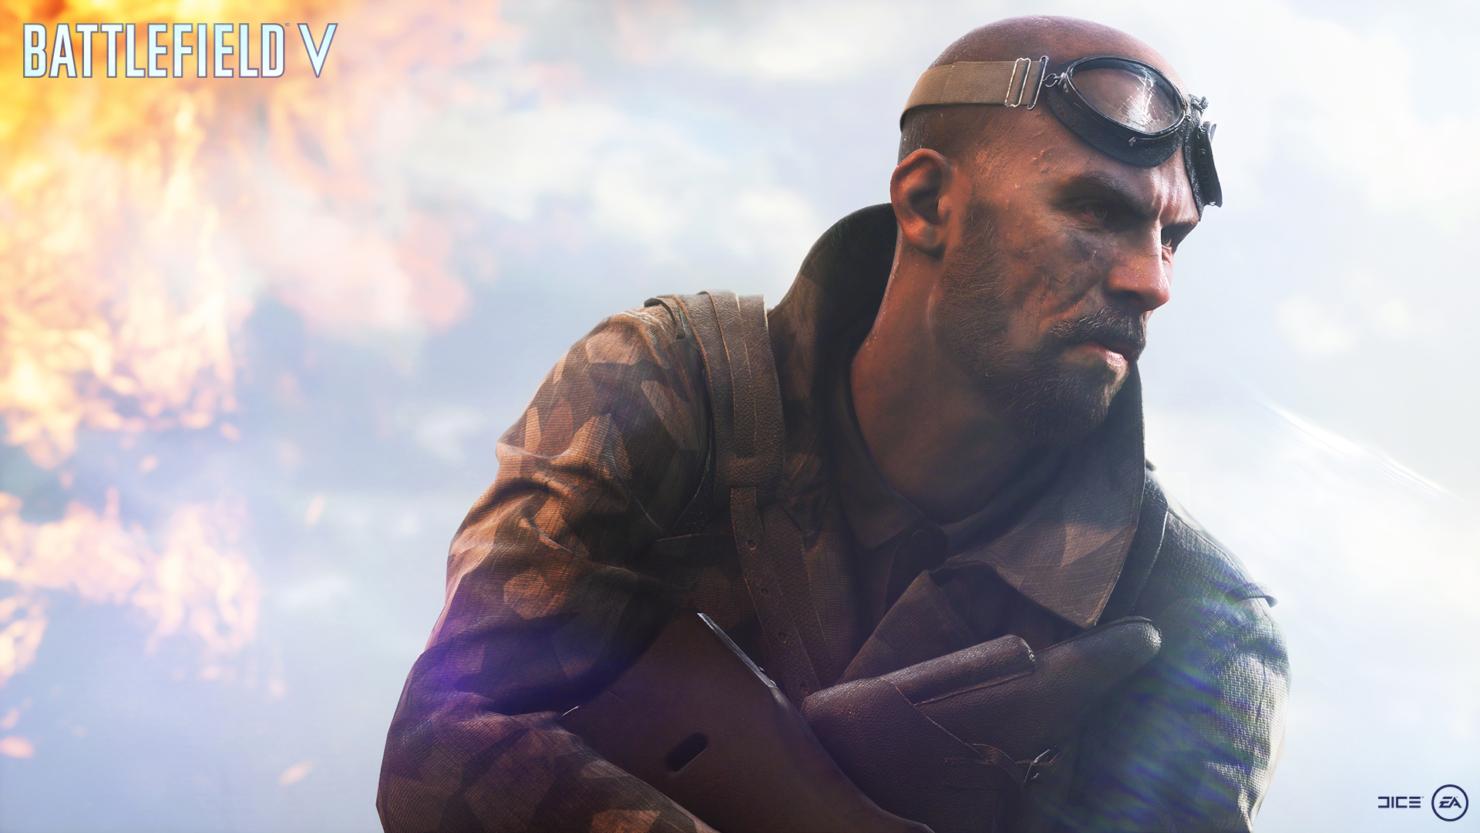 battlefield-v-reveal-screenshot-003